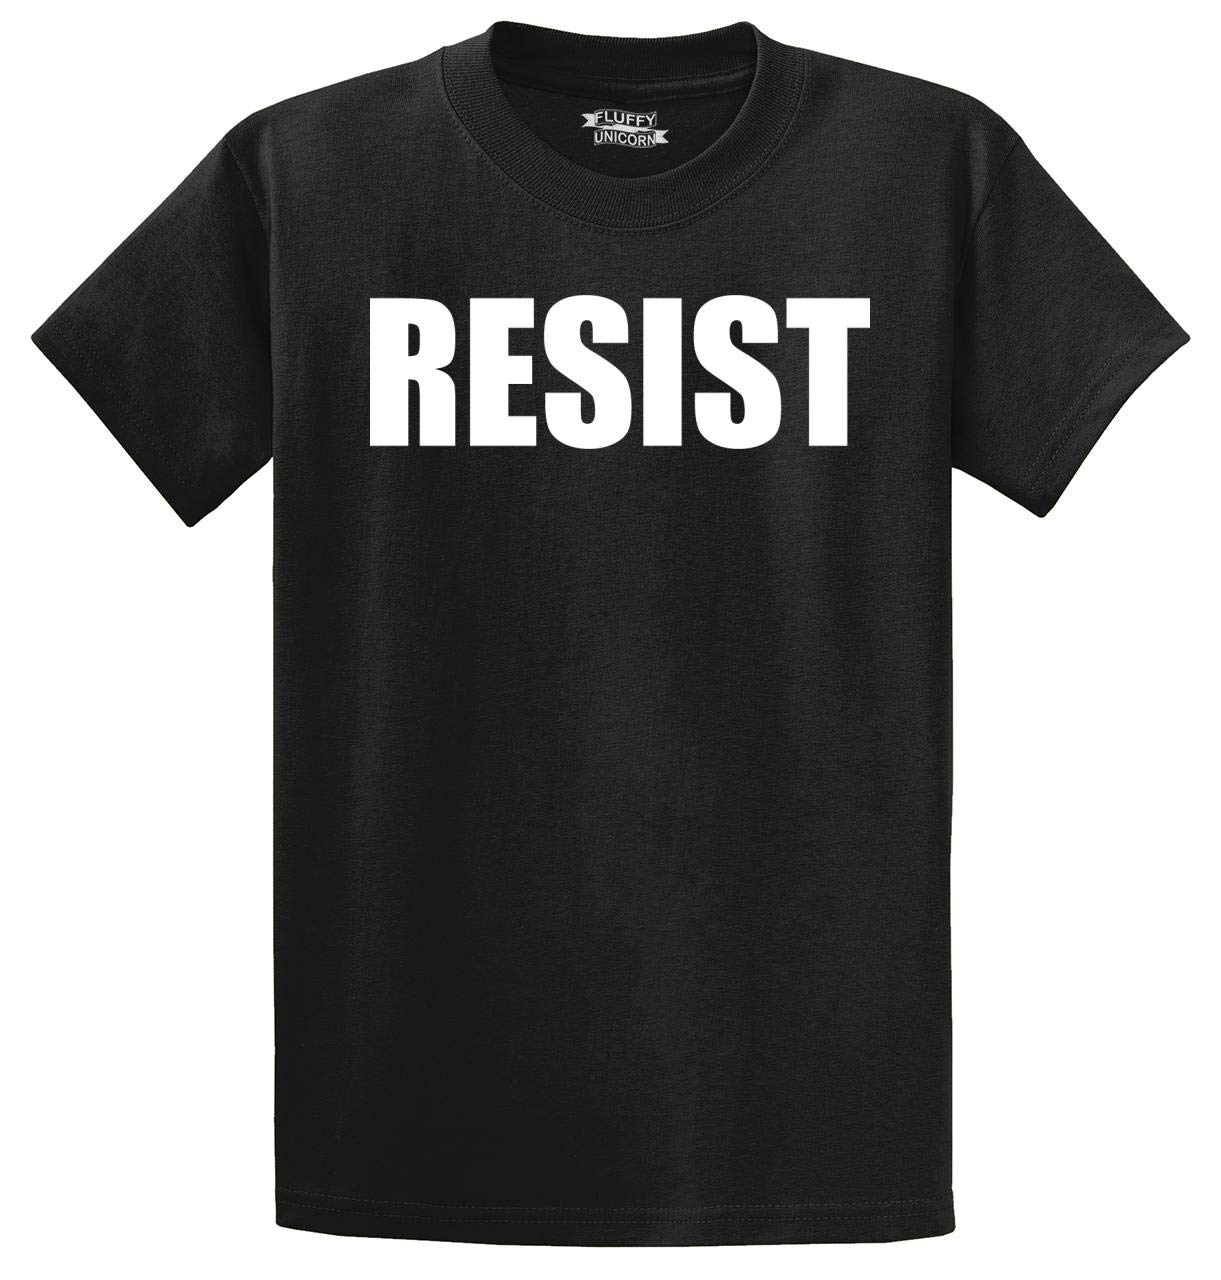 Comical Shirt Men's Resist Tee Anti Donald Trump Political Protest Trump T-Shirt